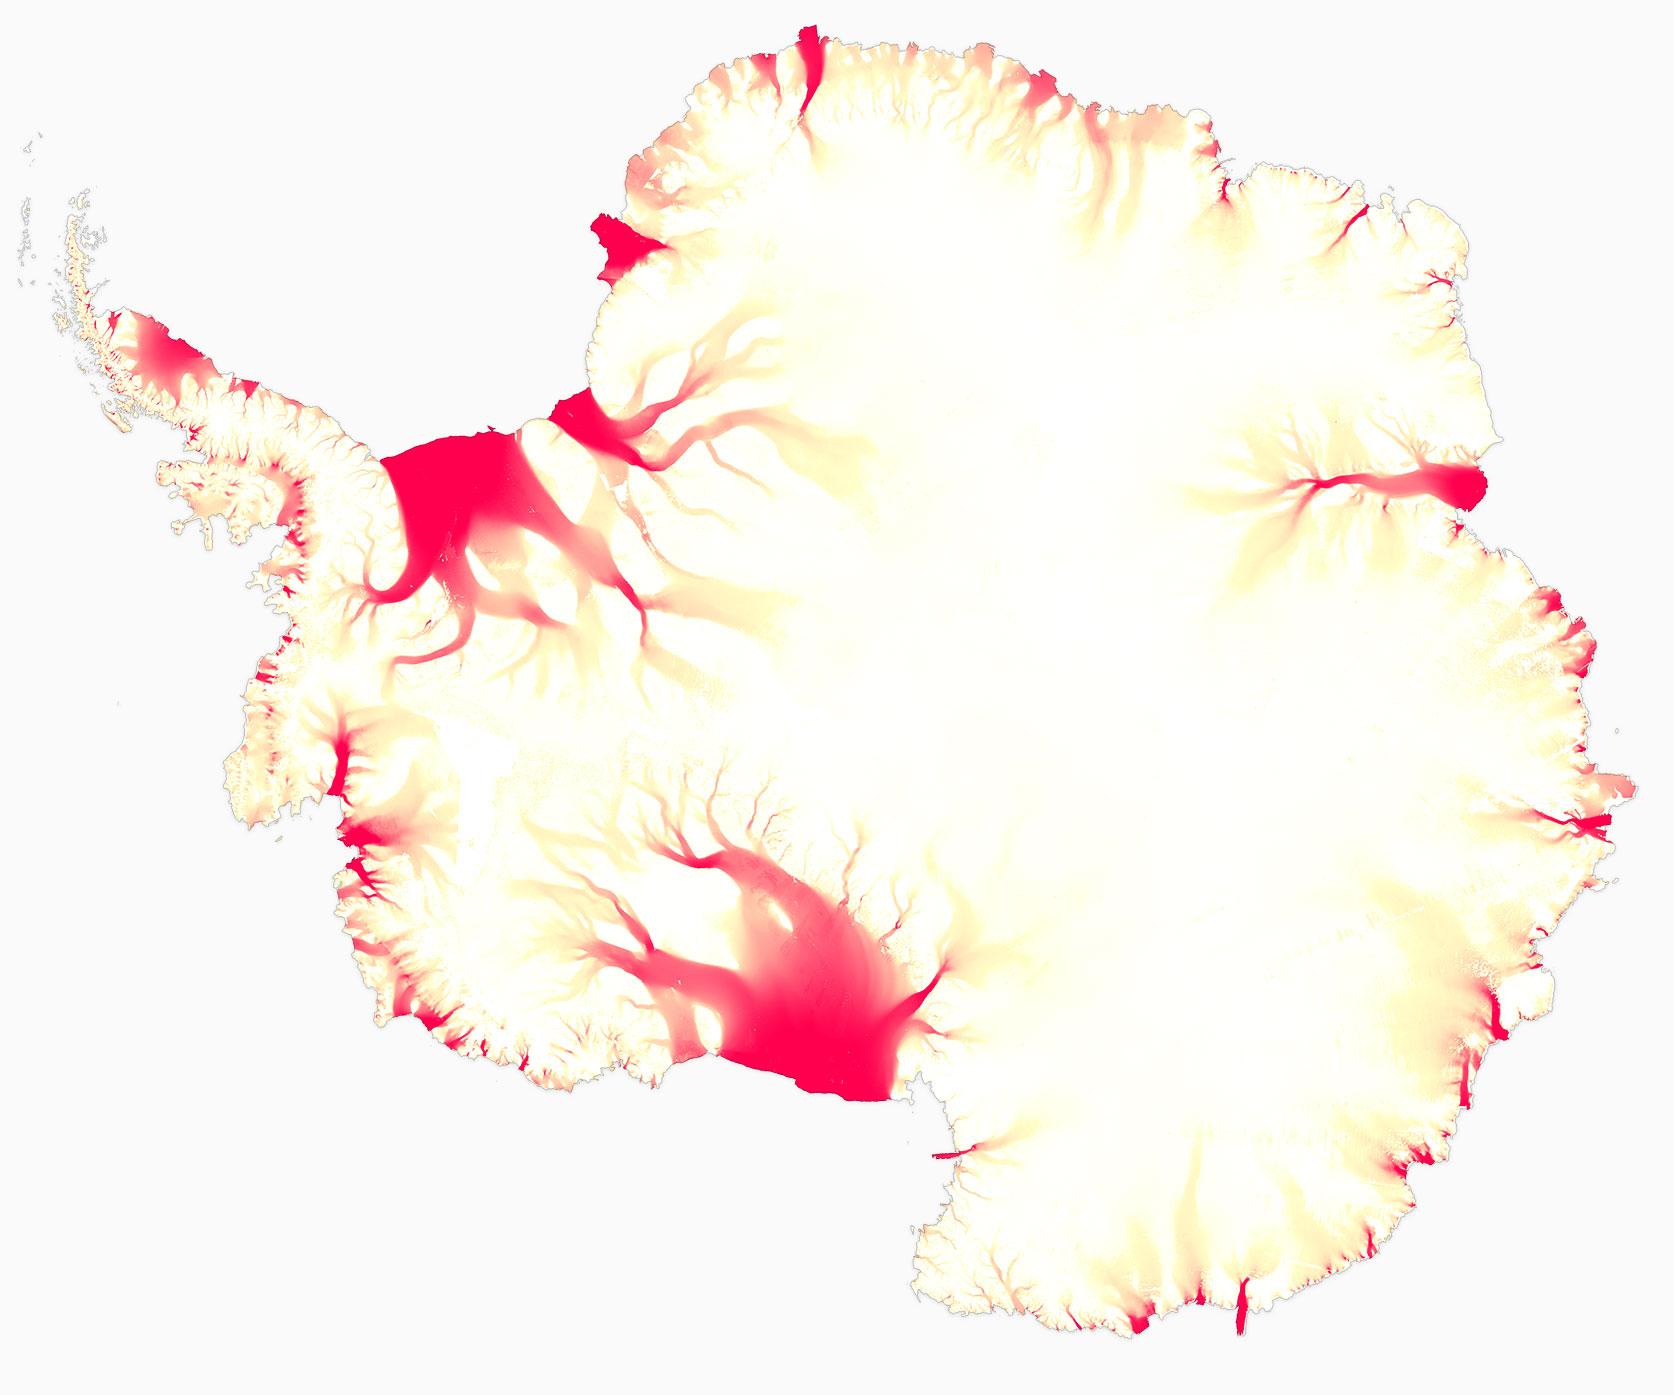 antarctica-velocities